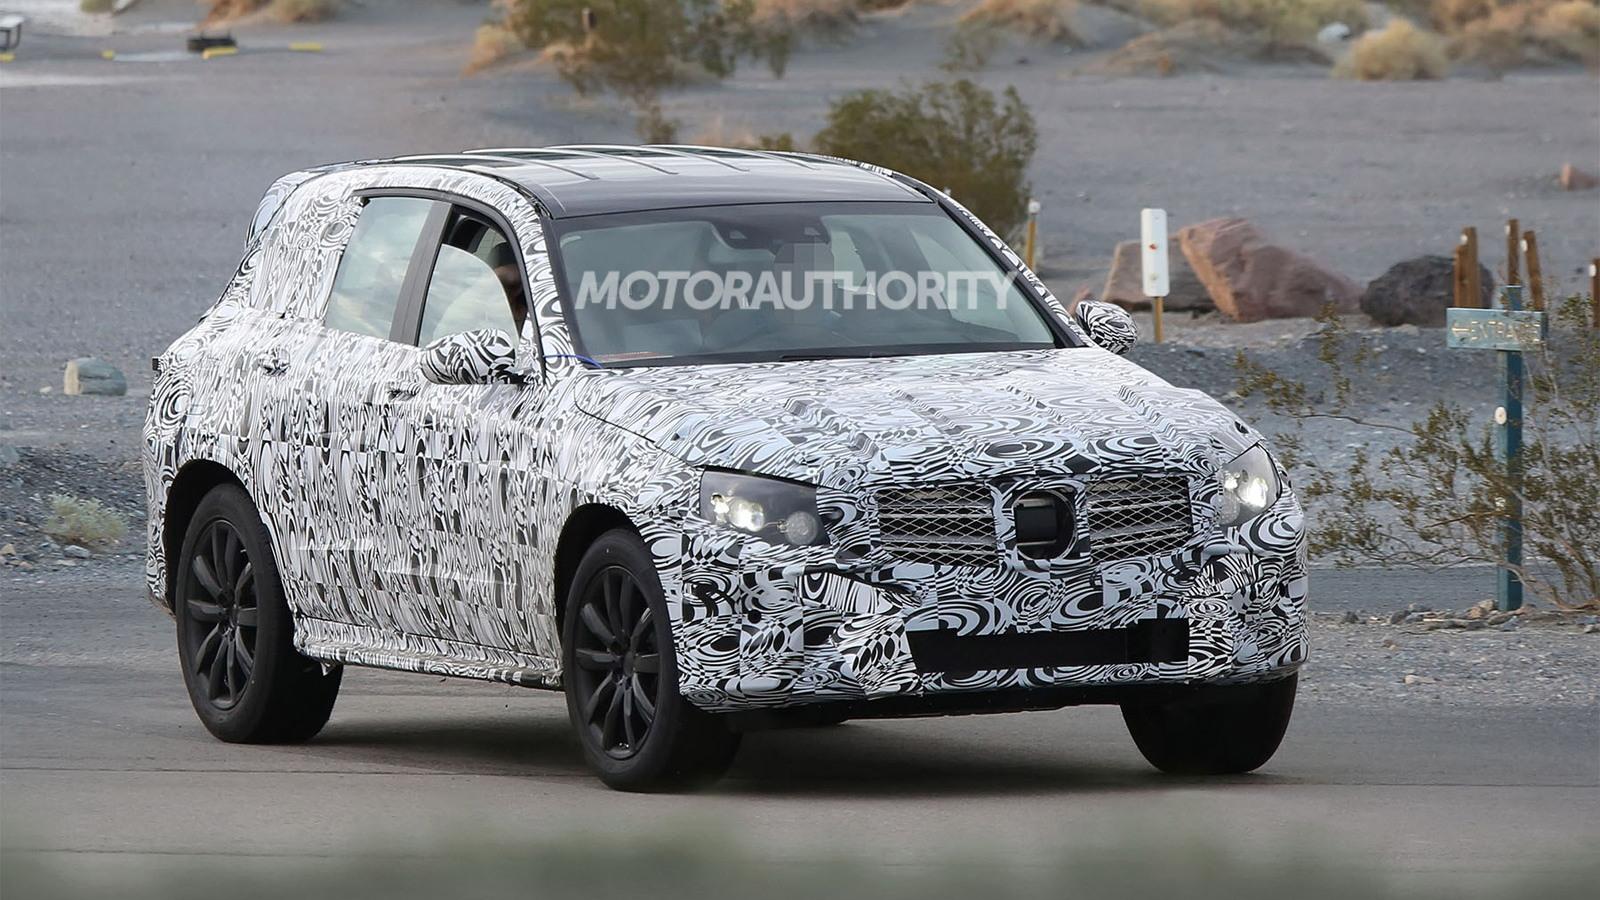 2016 Mercedes-Benz GLC (GLK-Class) spy shots - Image via S. Baldauf/SB-Medien